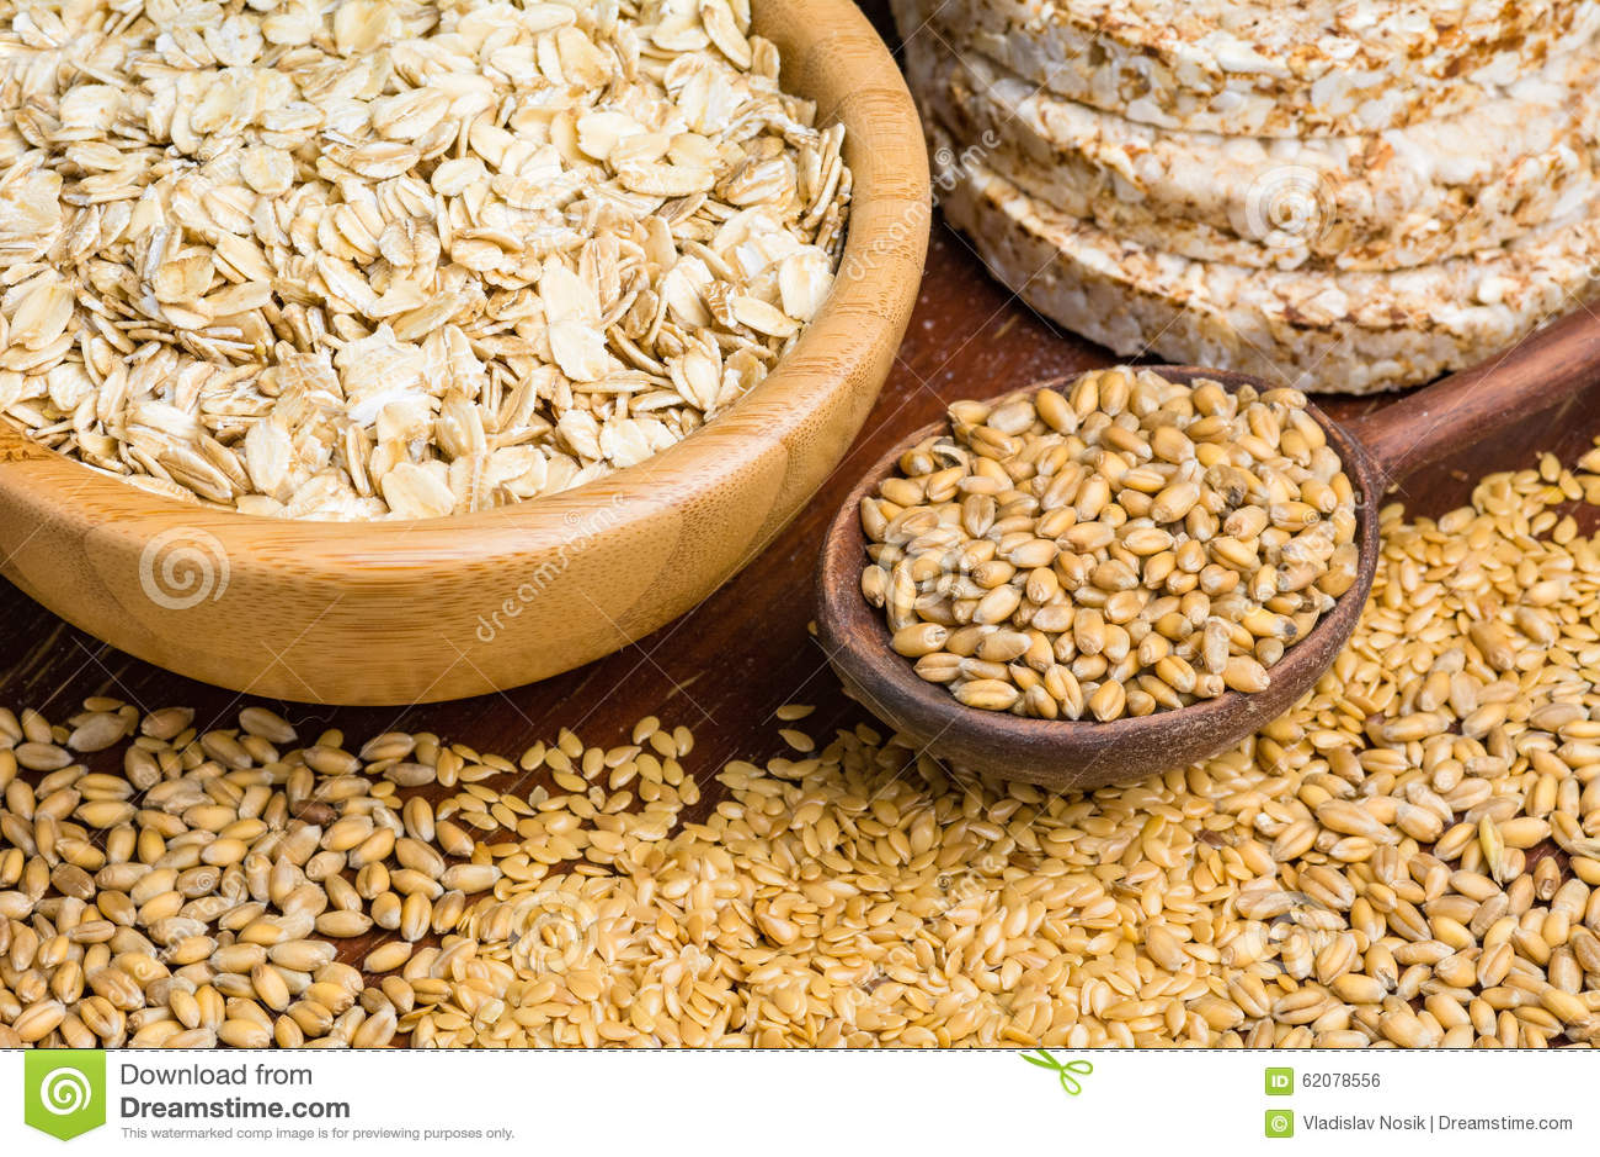 Whole Wheat Rice Cakes